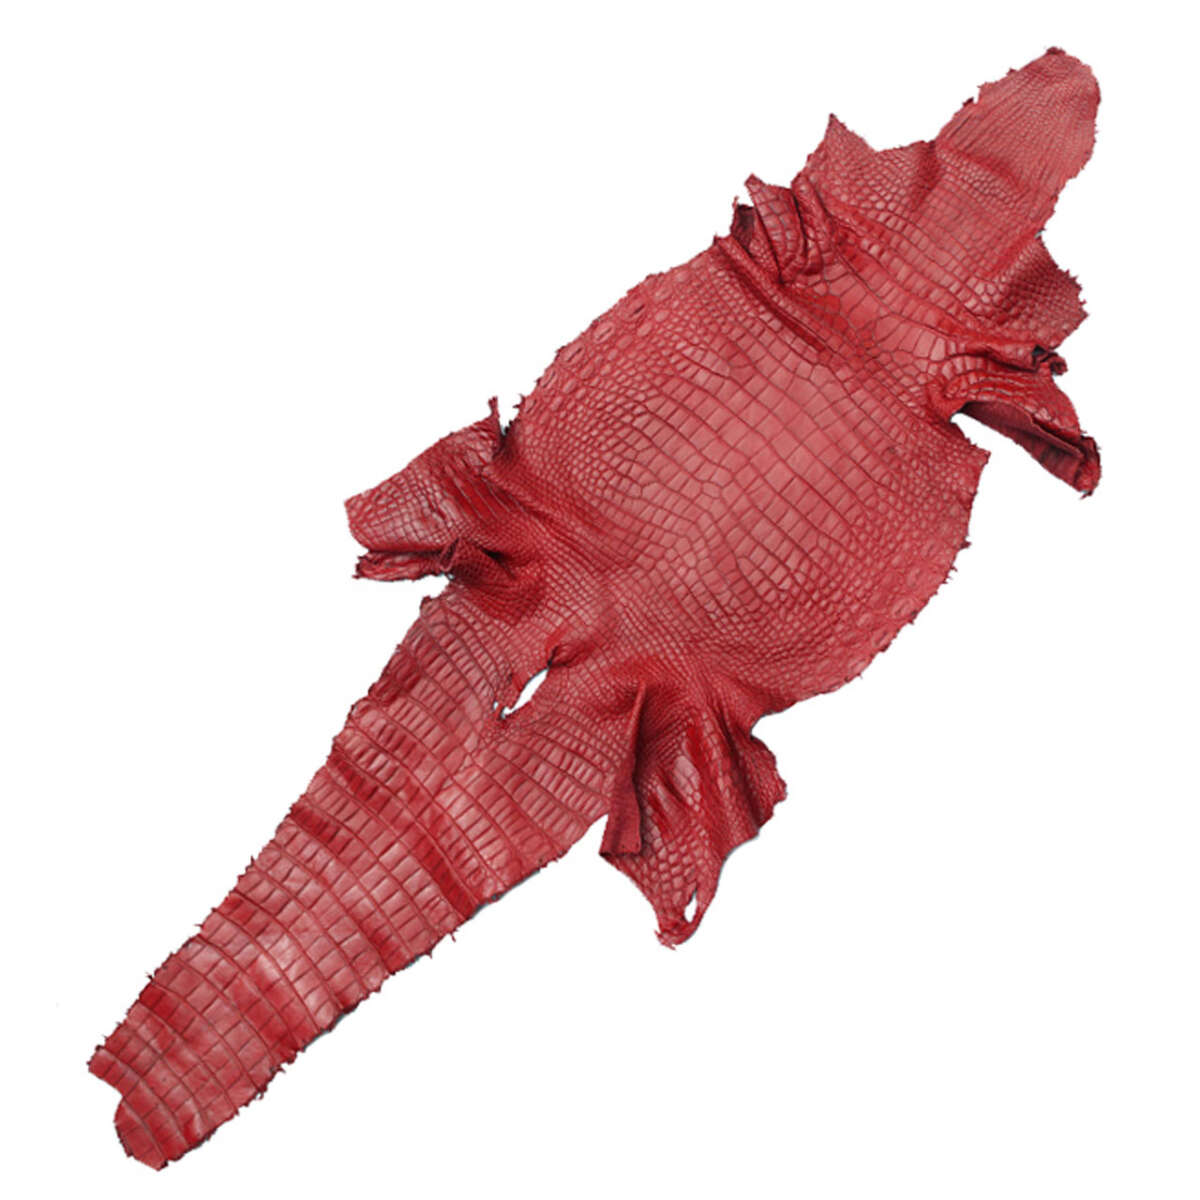 Da cá sấu thuộc S1222b